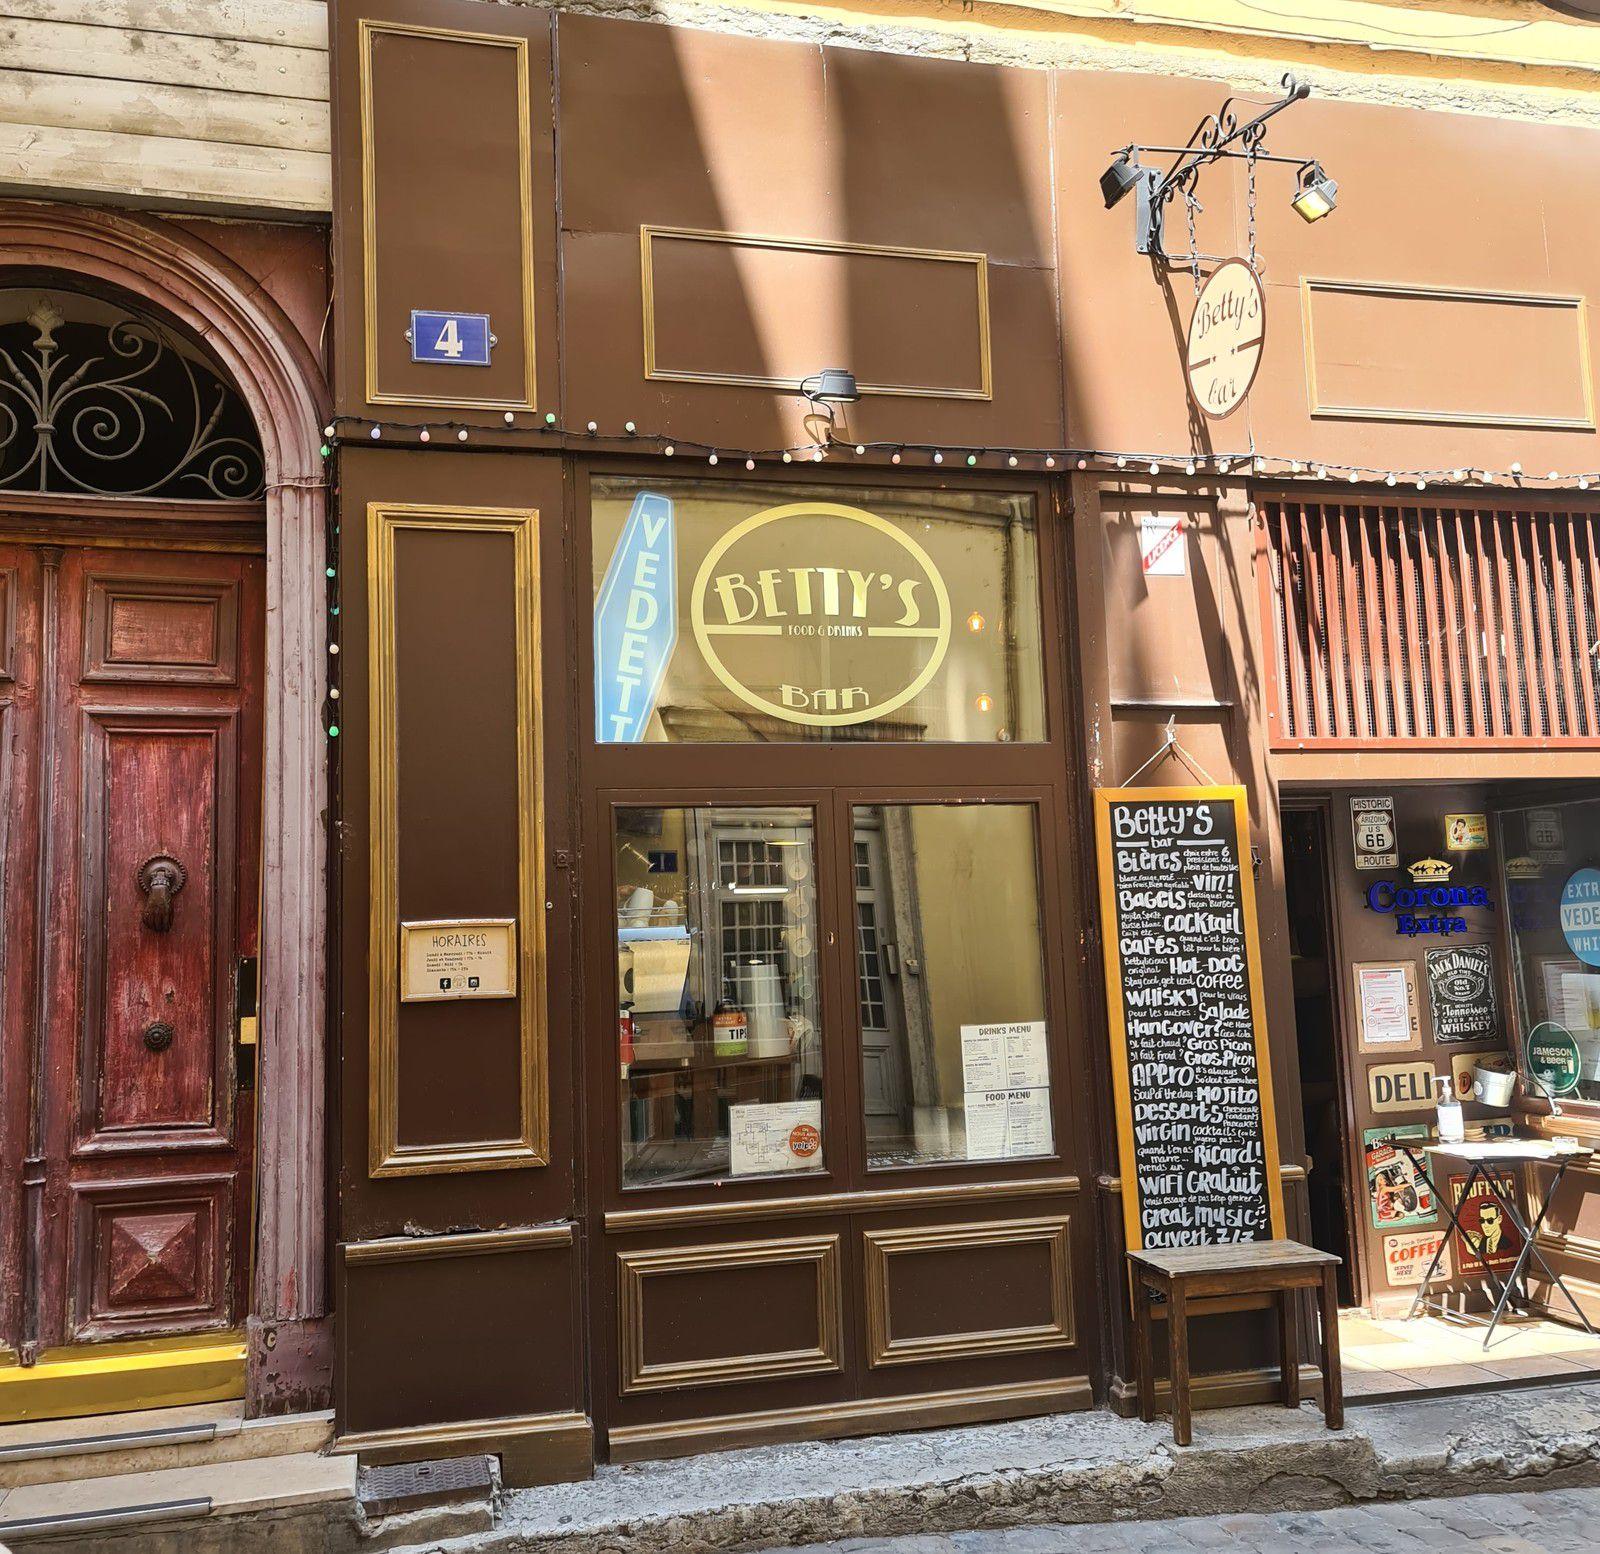 Chez Betty's Lyon